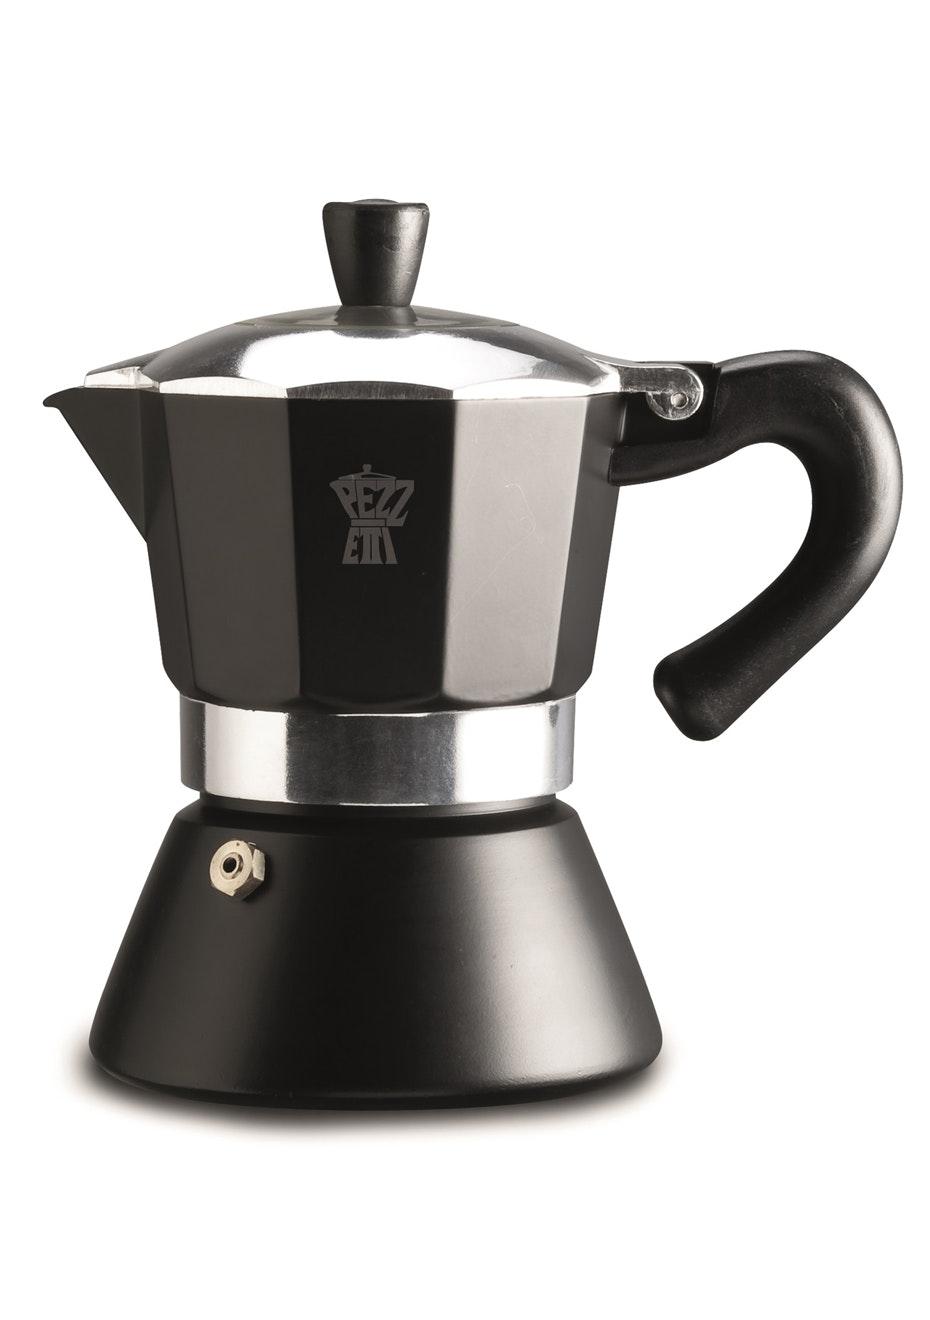 Pezzetti Bellexpress Black Induction Coffee Maker 3Cup